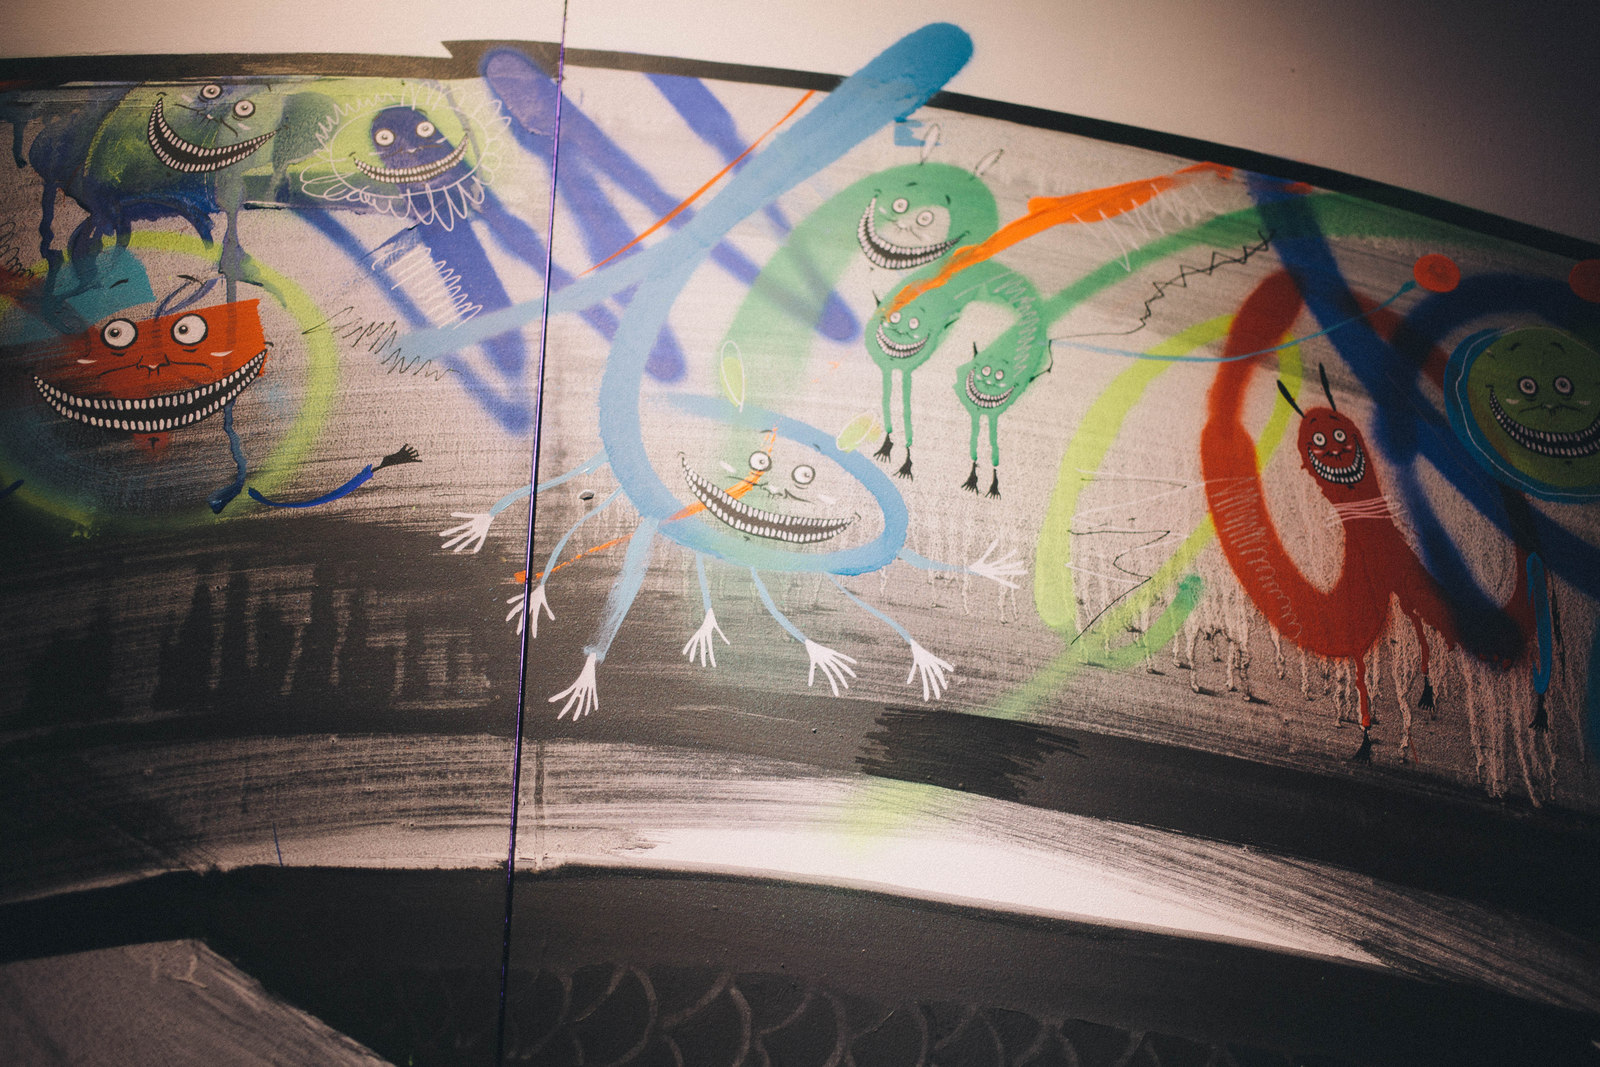 IMG_1972 国内外で活躍するアーティスト4組の「作品の向こう側」| ジャーナル スタンダード「オムニバス展」密着レポート!